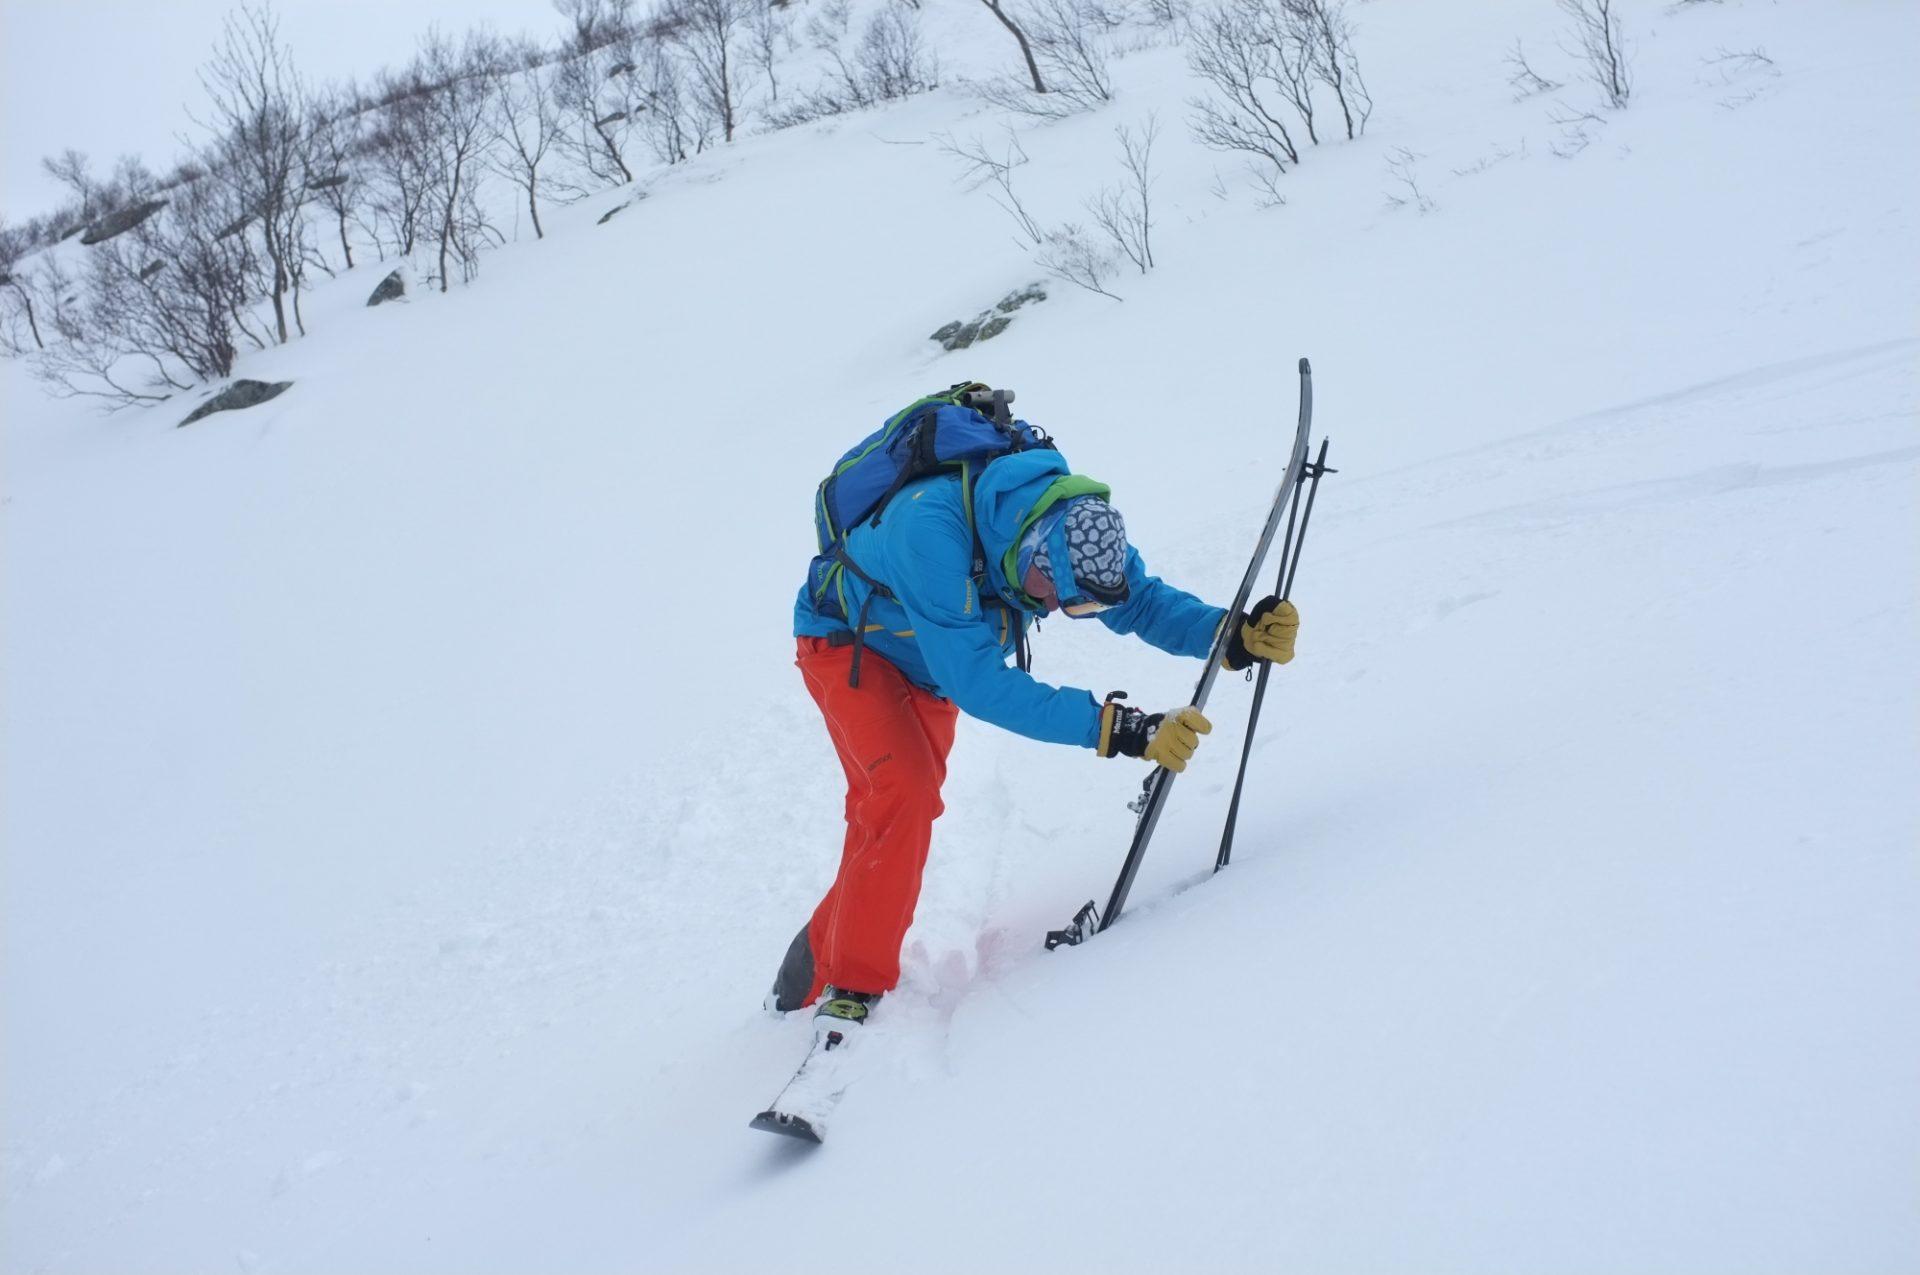 Bergsteigertipp Ski ausziehen 2 I (c) Peter Plattner